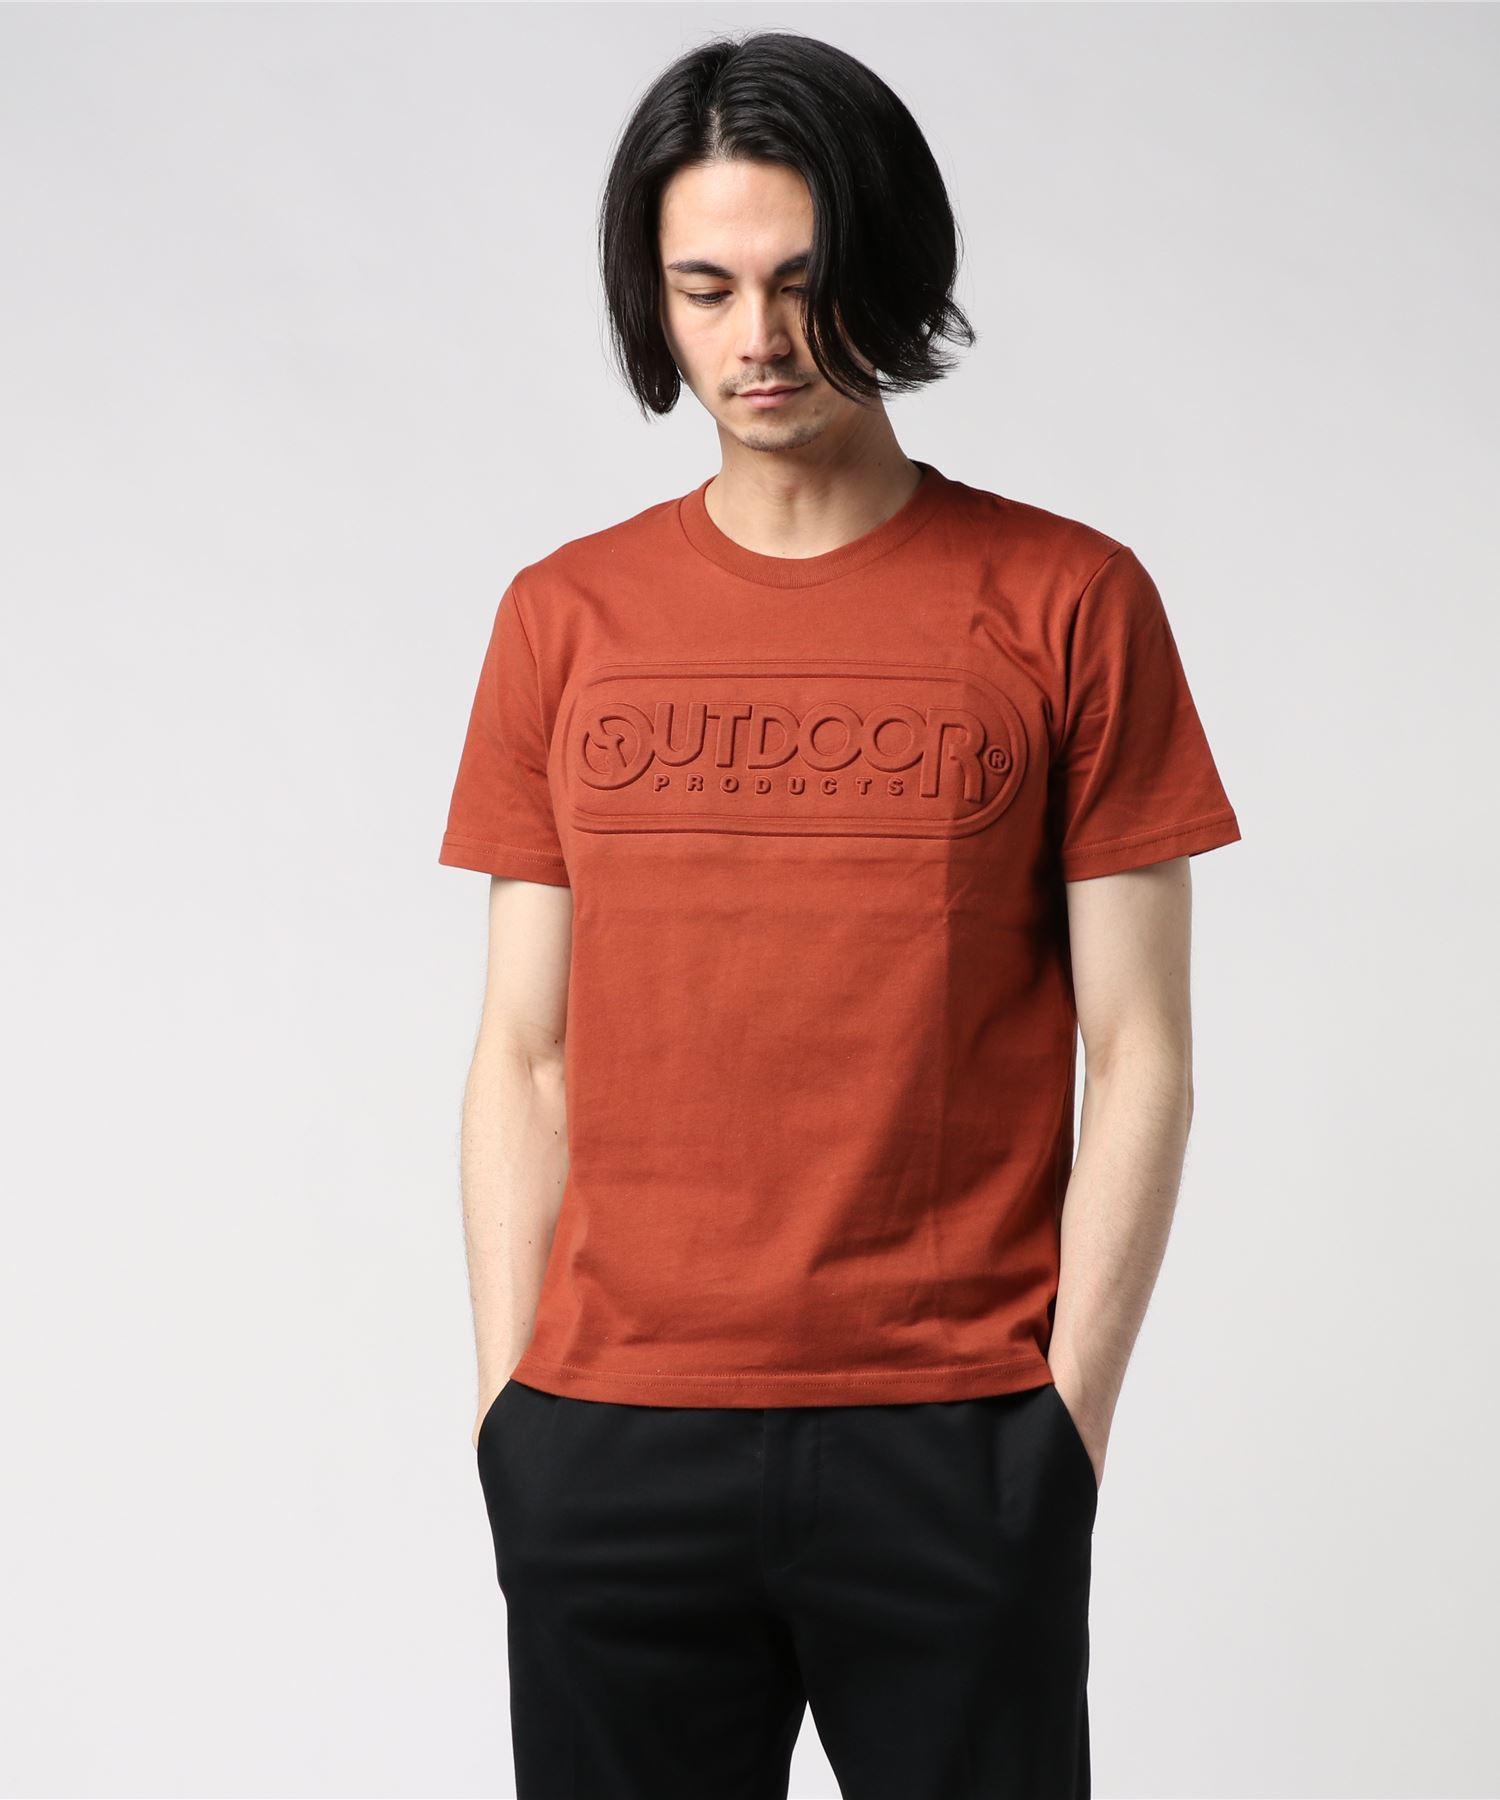 【OUTDOOR PRODUCTS】エンボスロゴTシャツ 同色プリント ブランドロゴ